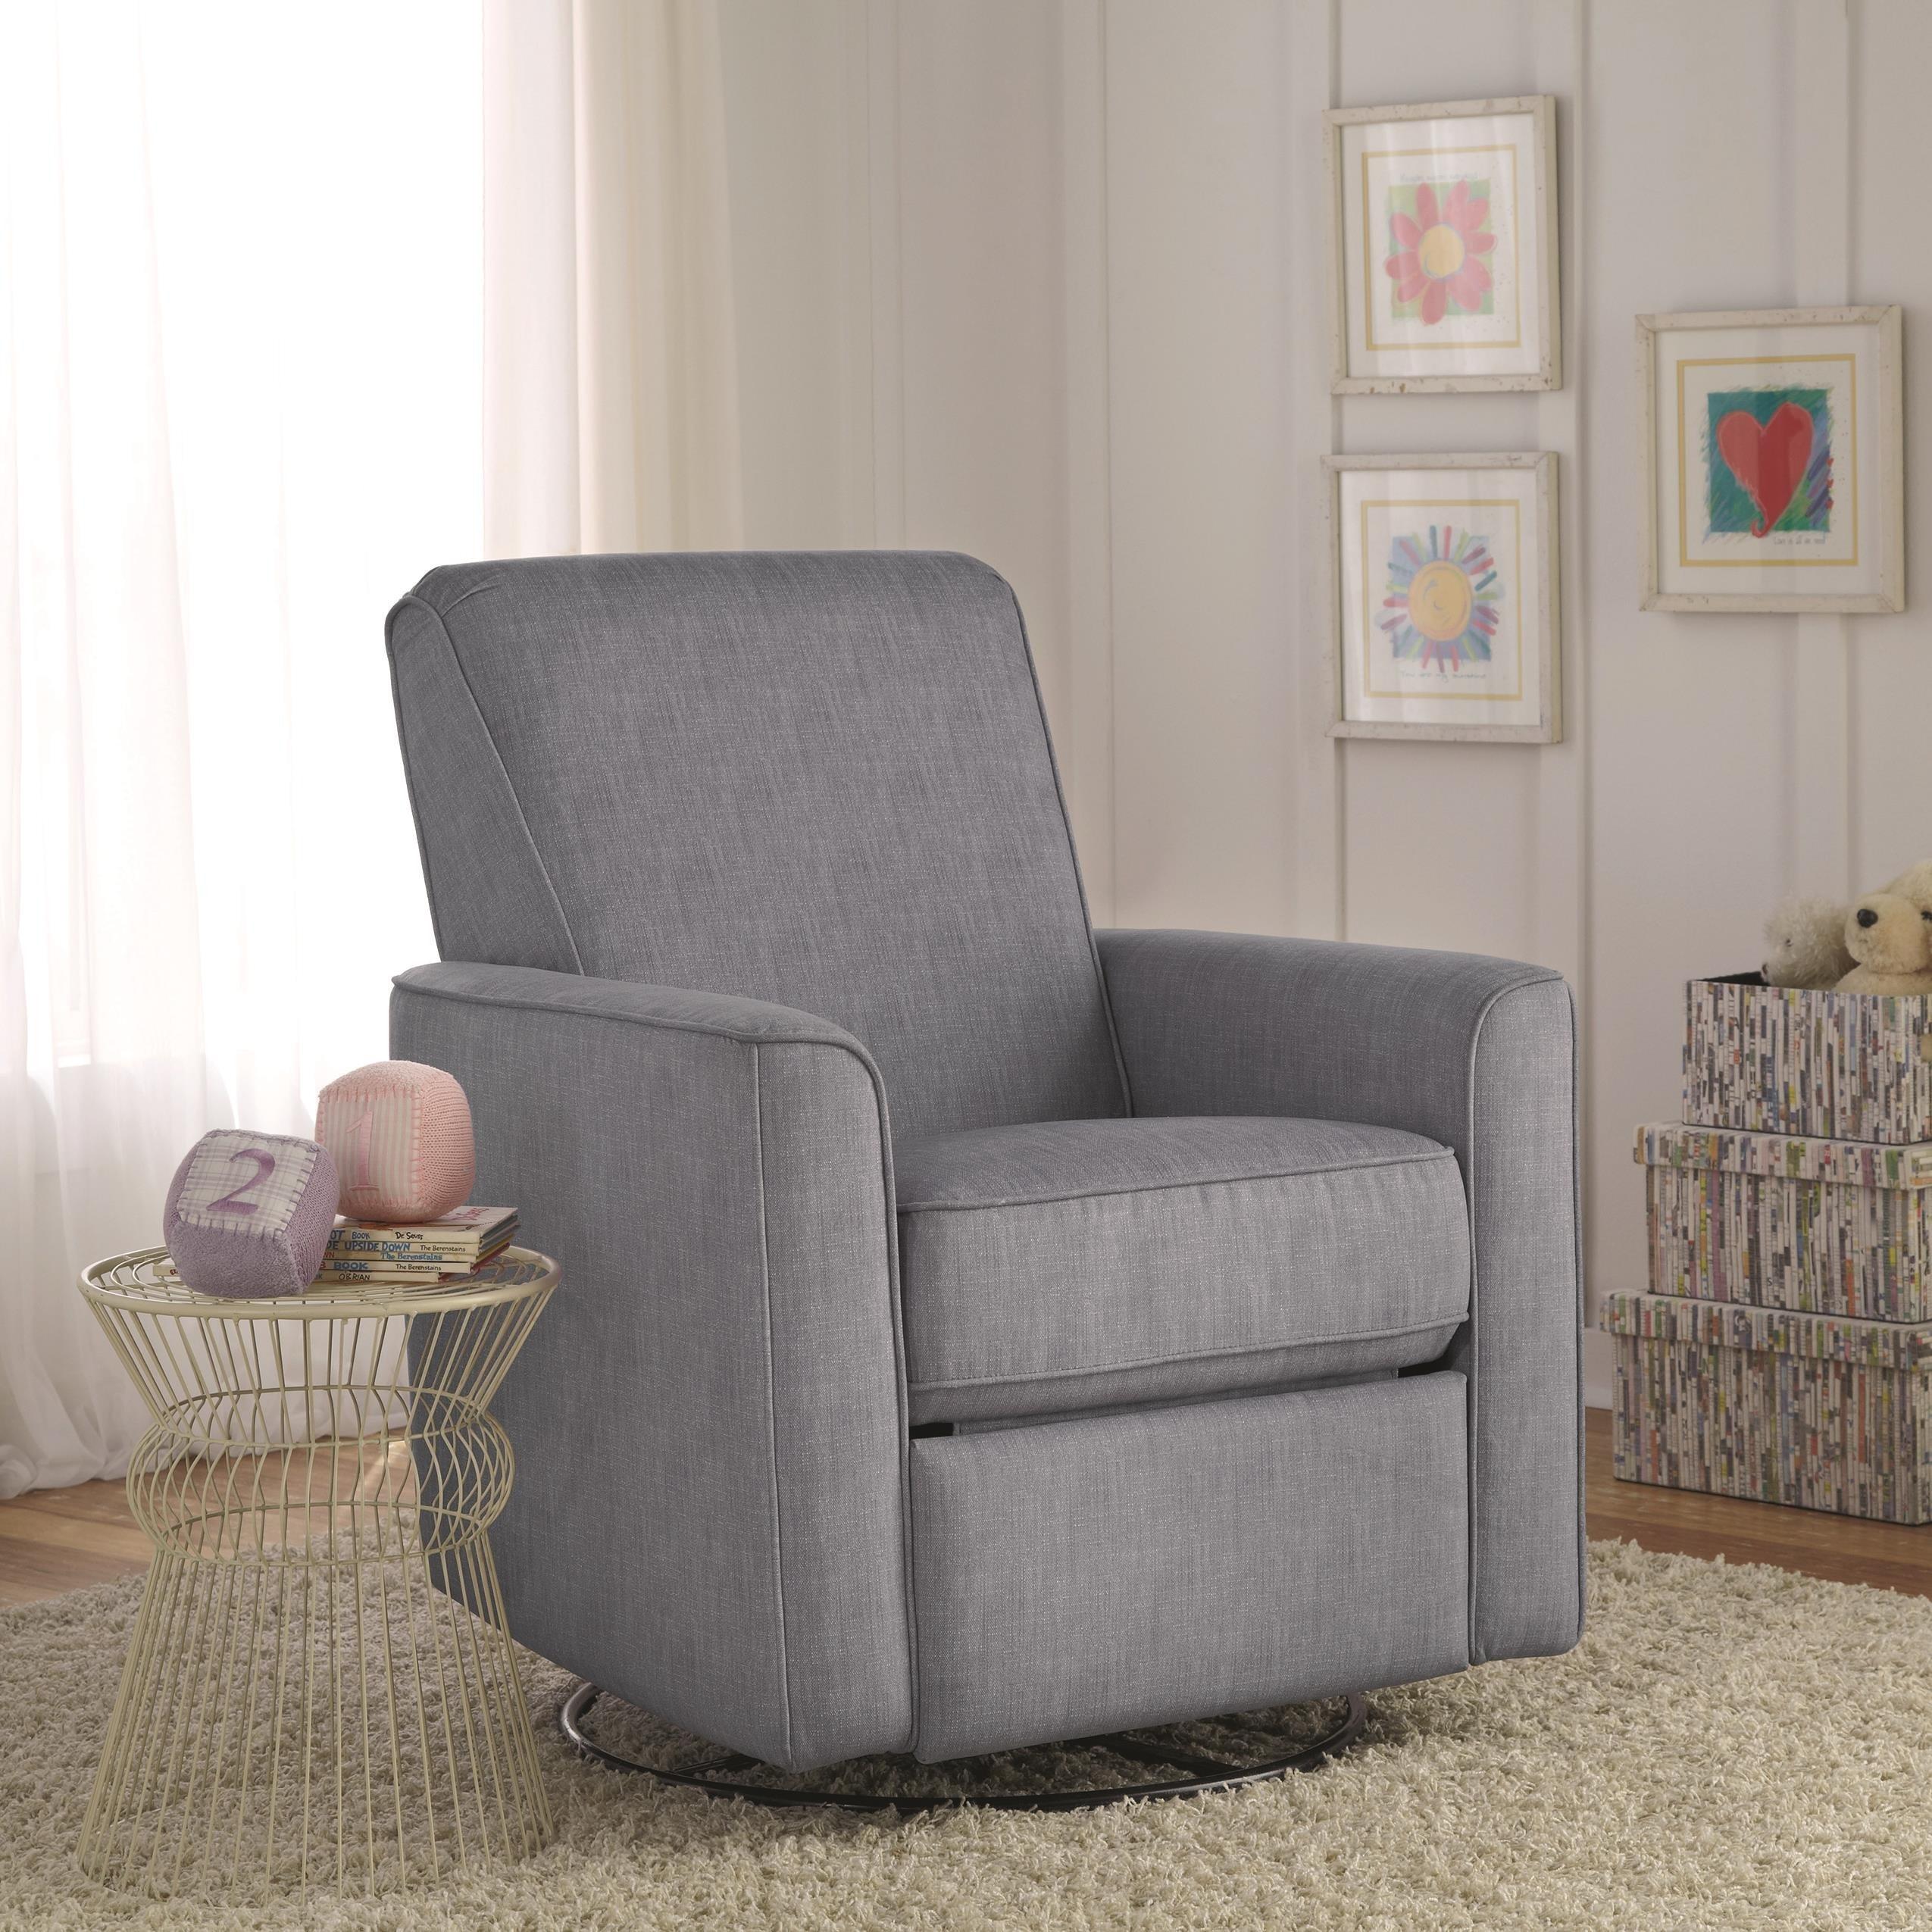 Zoey Grey Nursery Swivel Glider Recliner Chair, Size Stan...